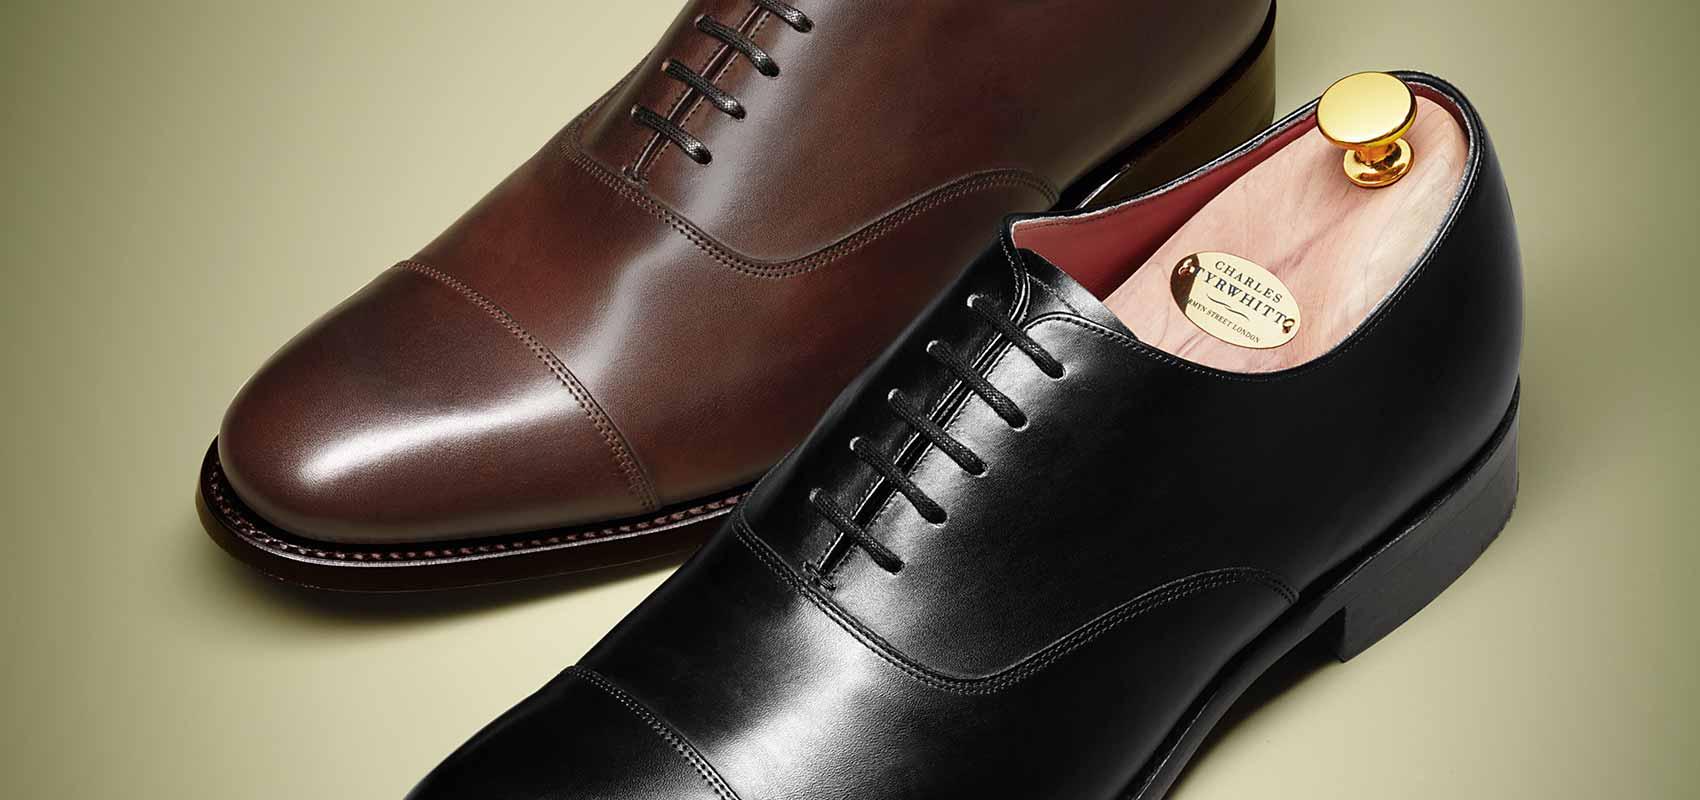 Charles Tyrwhitt Oxford shoes